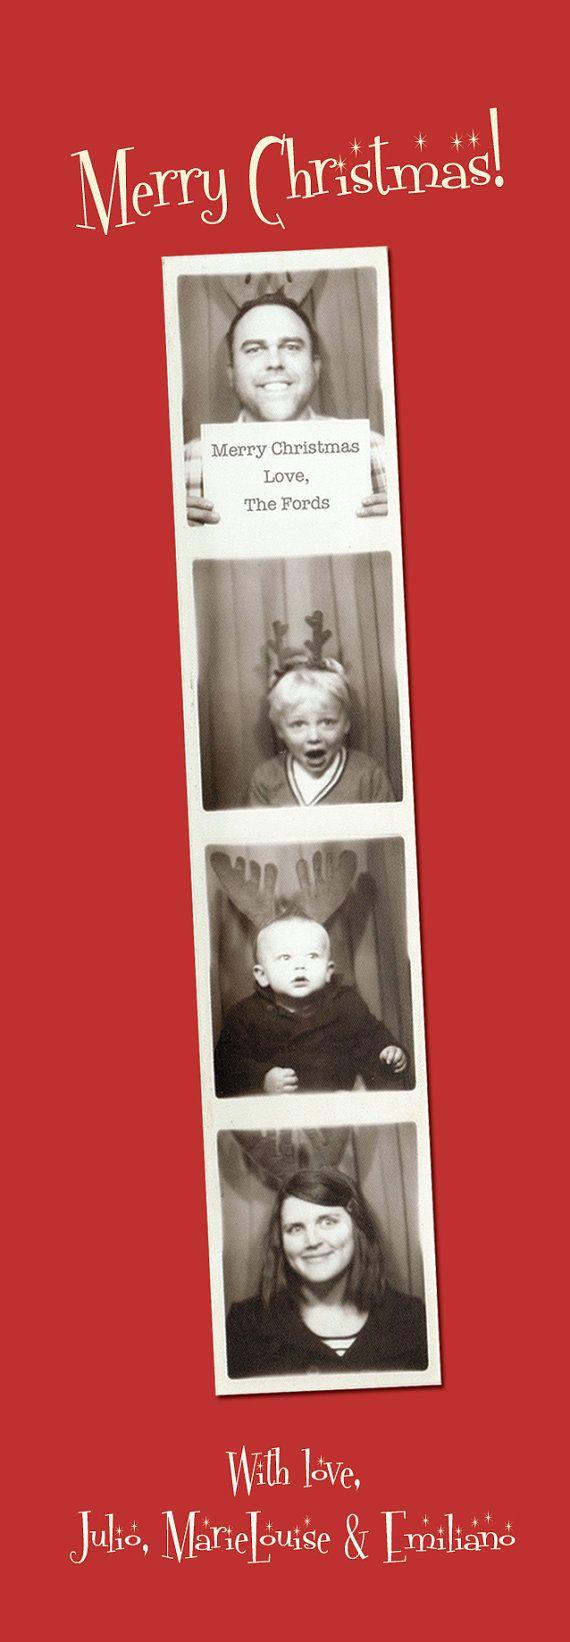 Santa Claus Photo Booth Picture Bookmark Greeting Card Ho Ho Ho Vintage Retro Christmas I Design You Print Book Mark Santa Claus Photos Funny Christmas Cards Baby Christmas Photos